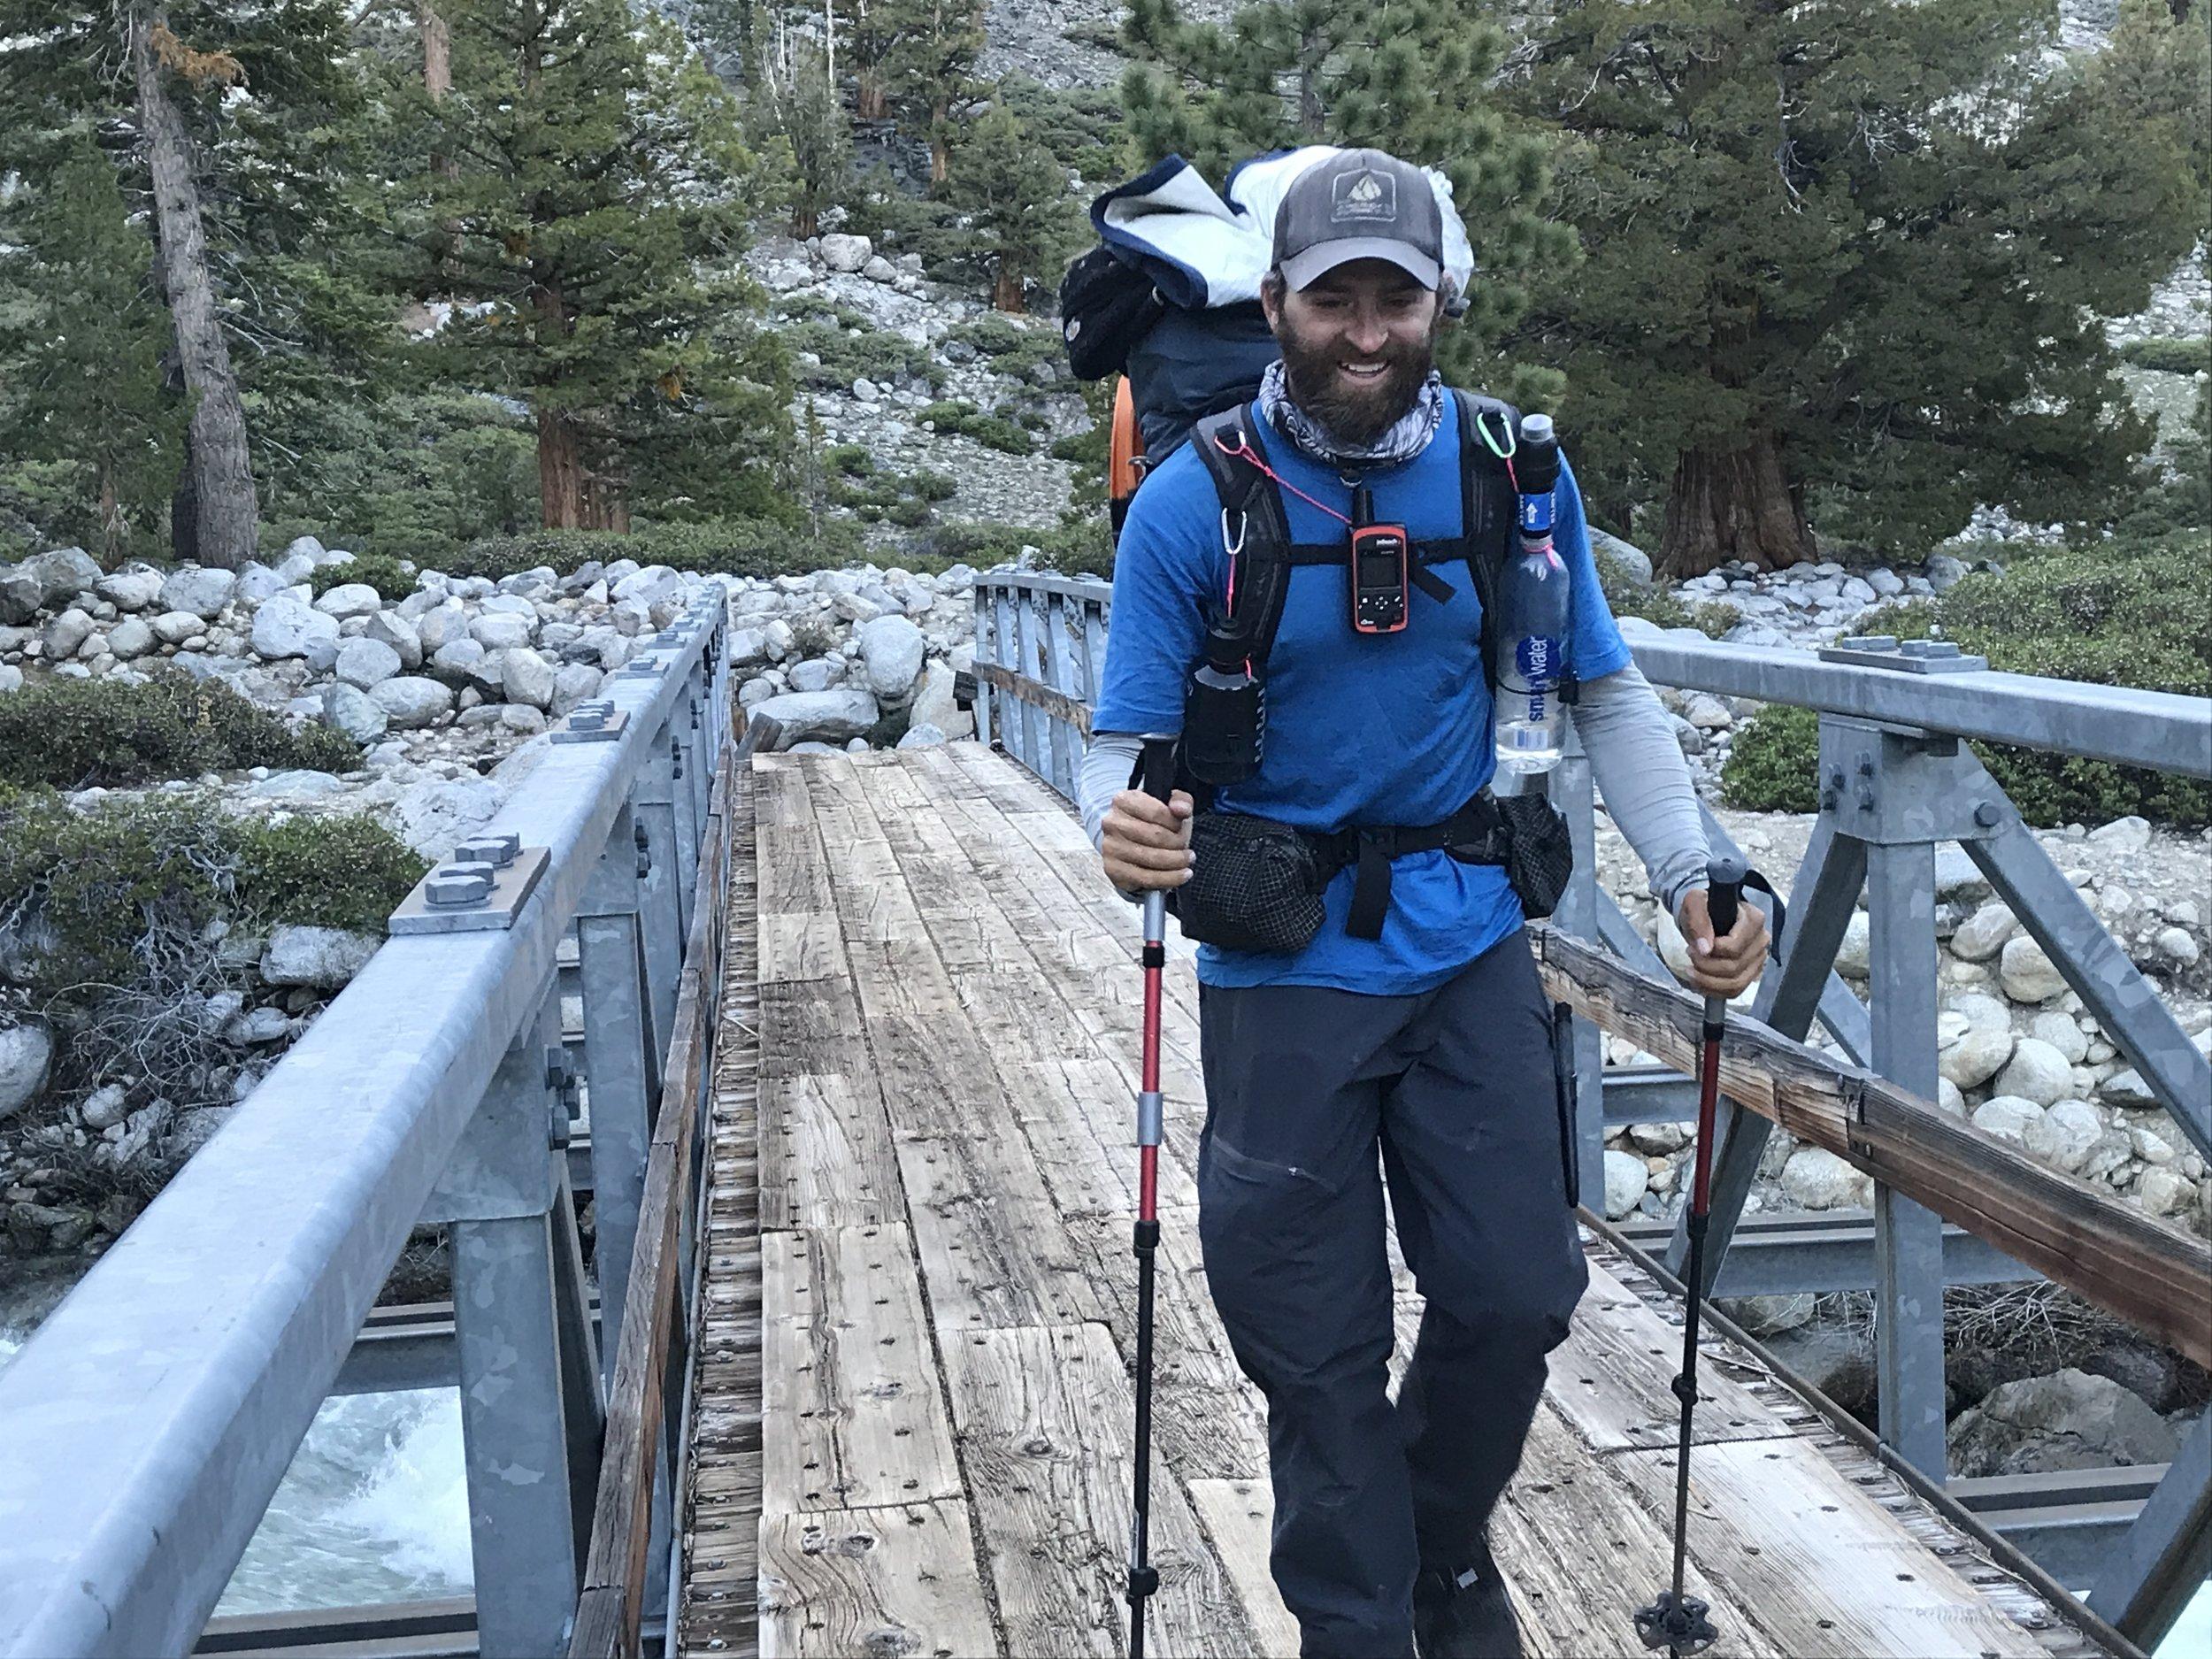 Crossing Piute Creek bridge, leaving Kings Canyon/Sequoia...